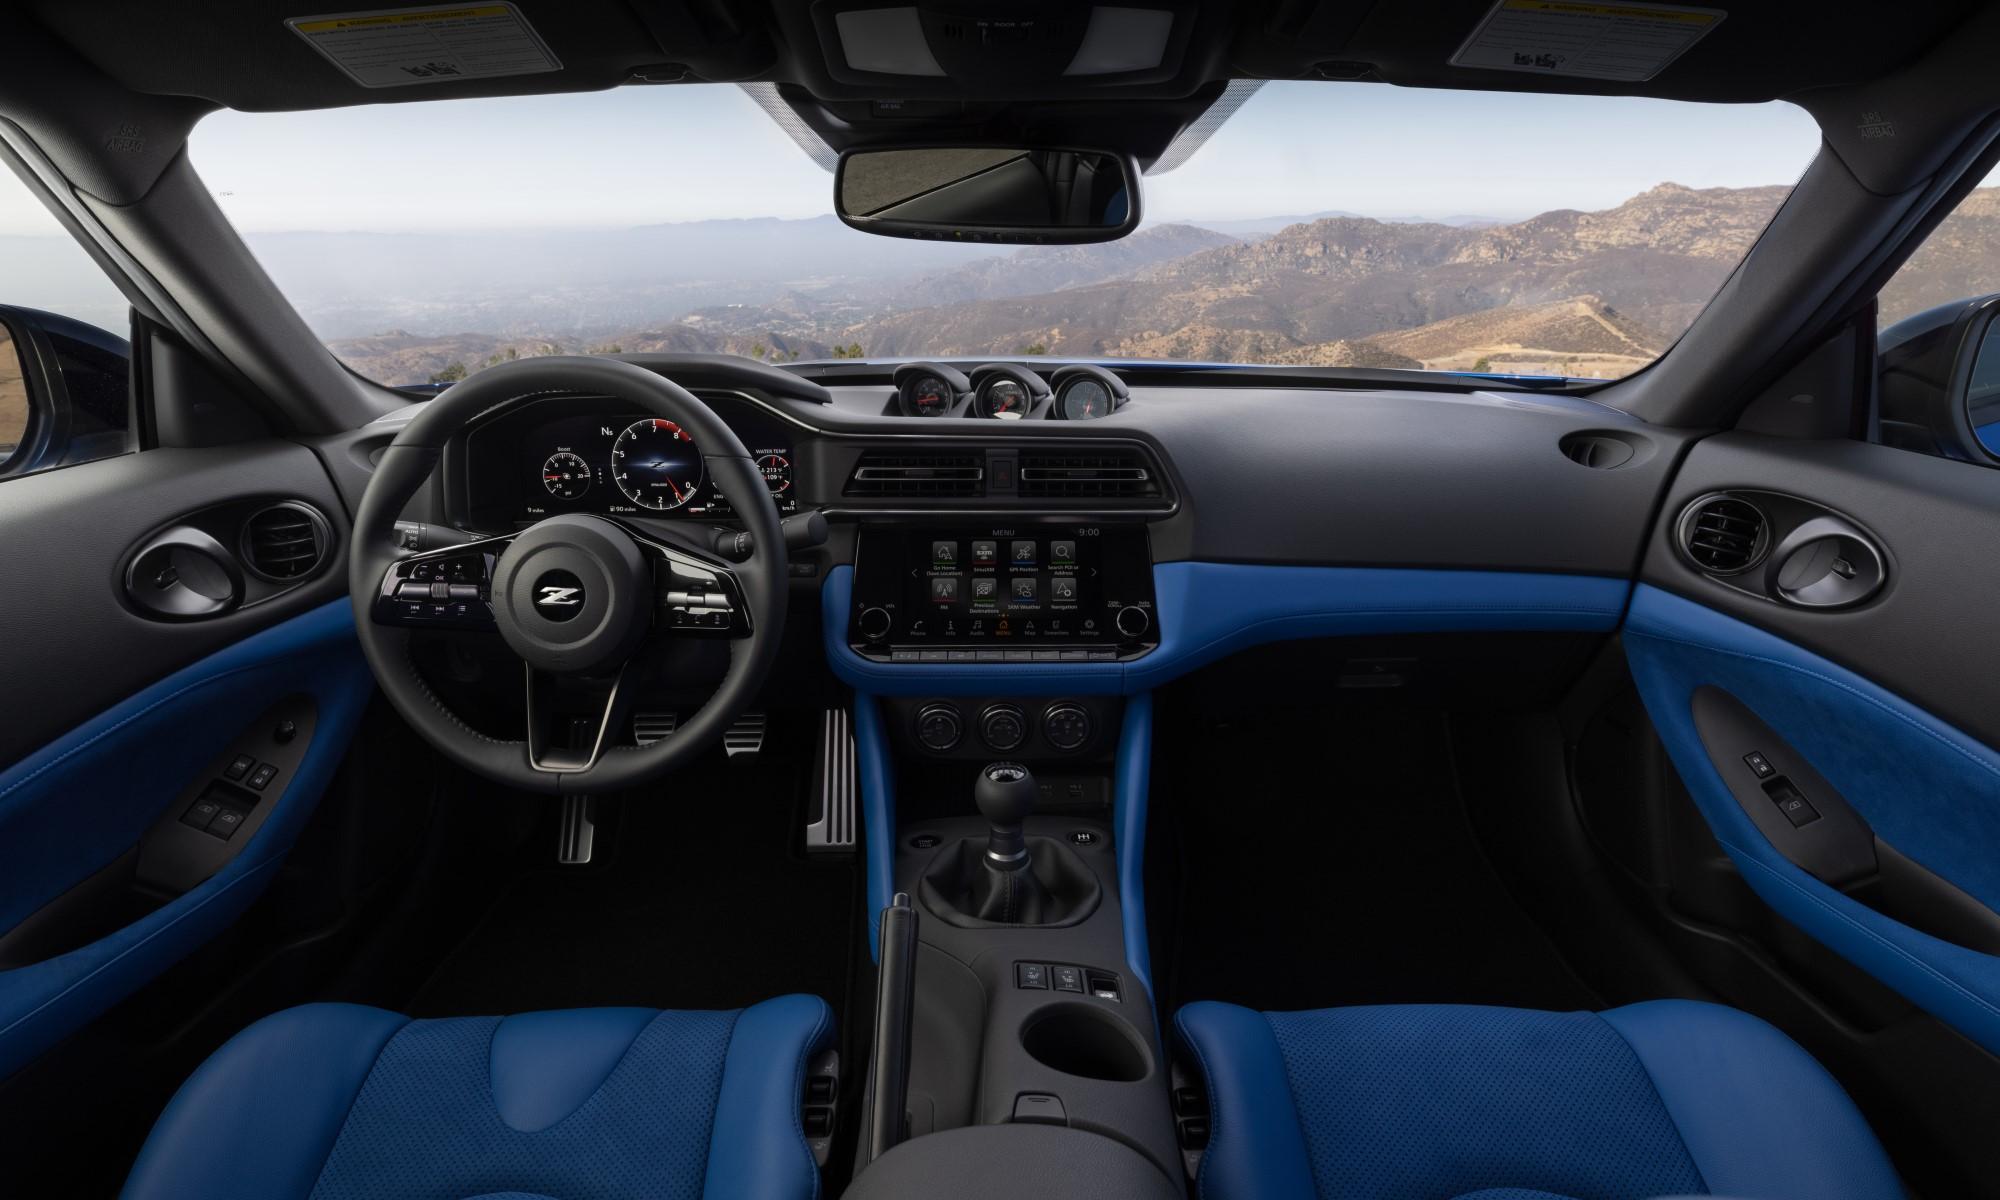 Nissan Z Sportscar cabin